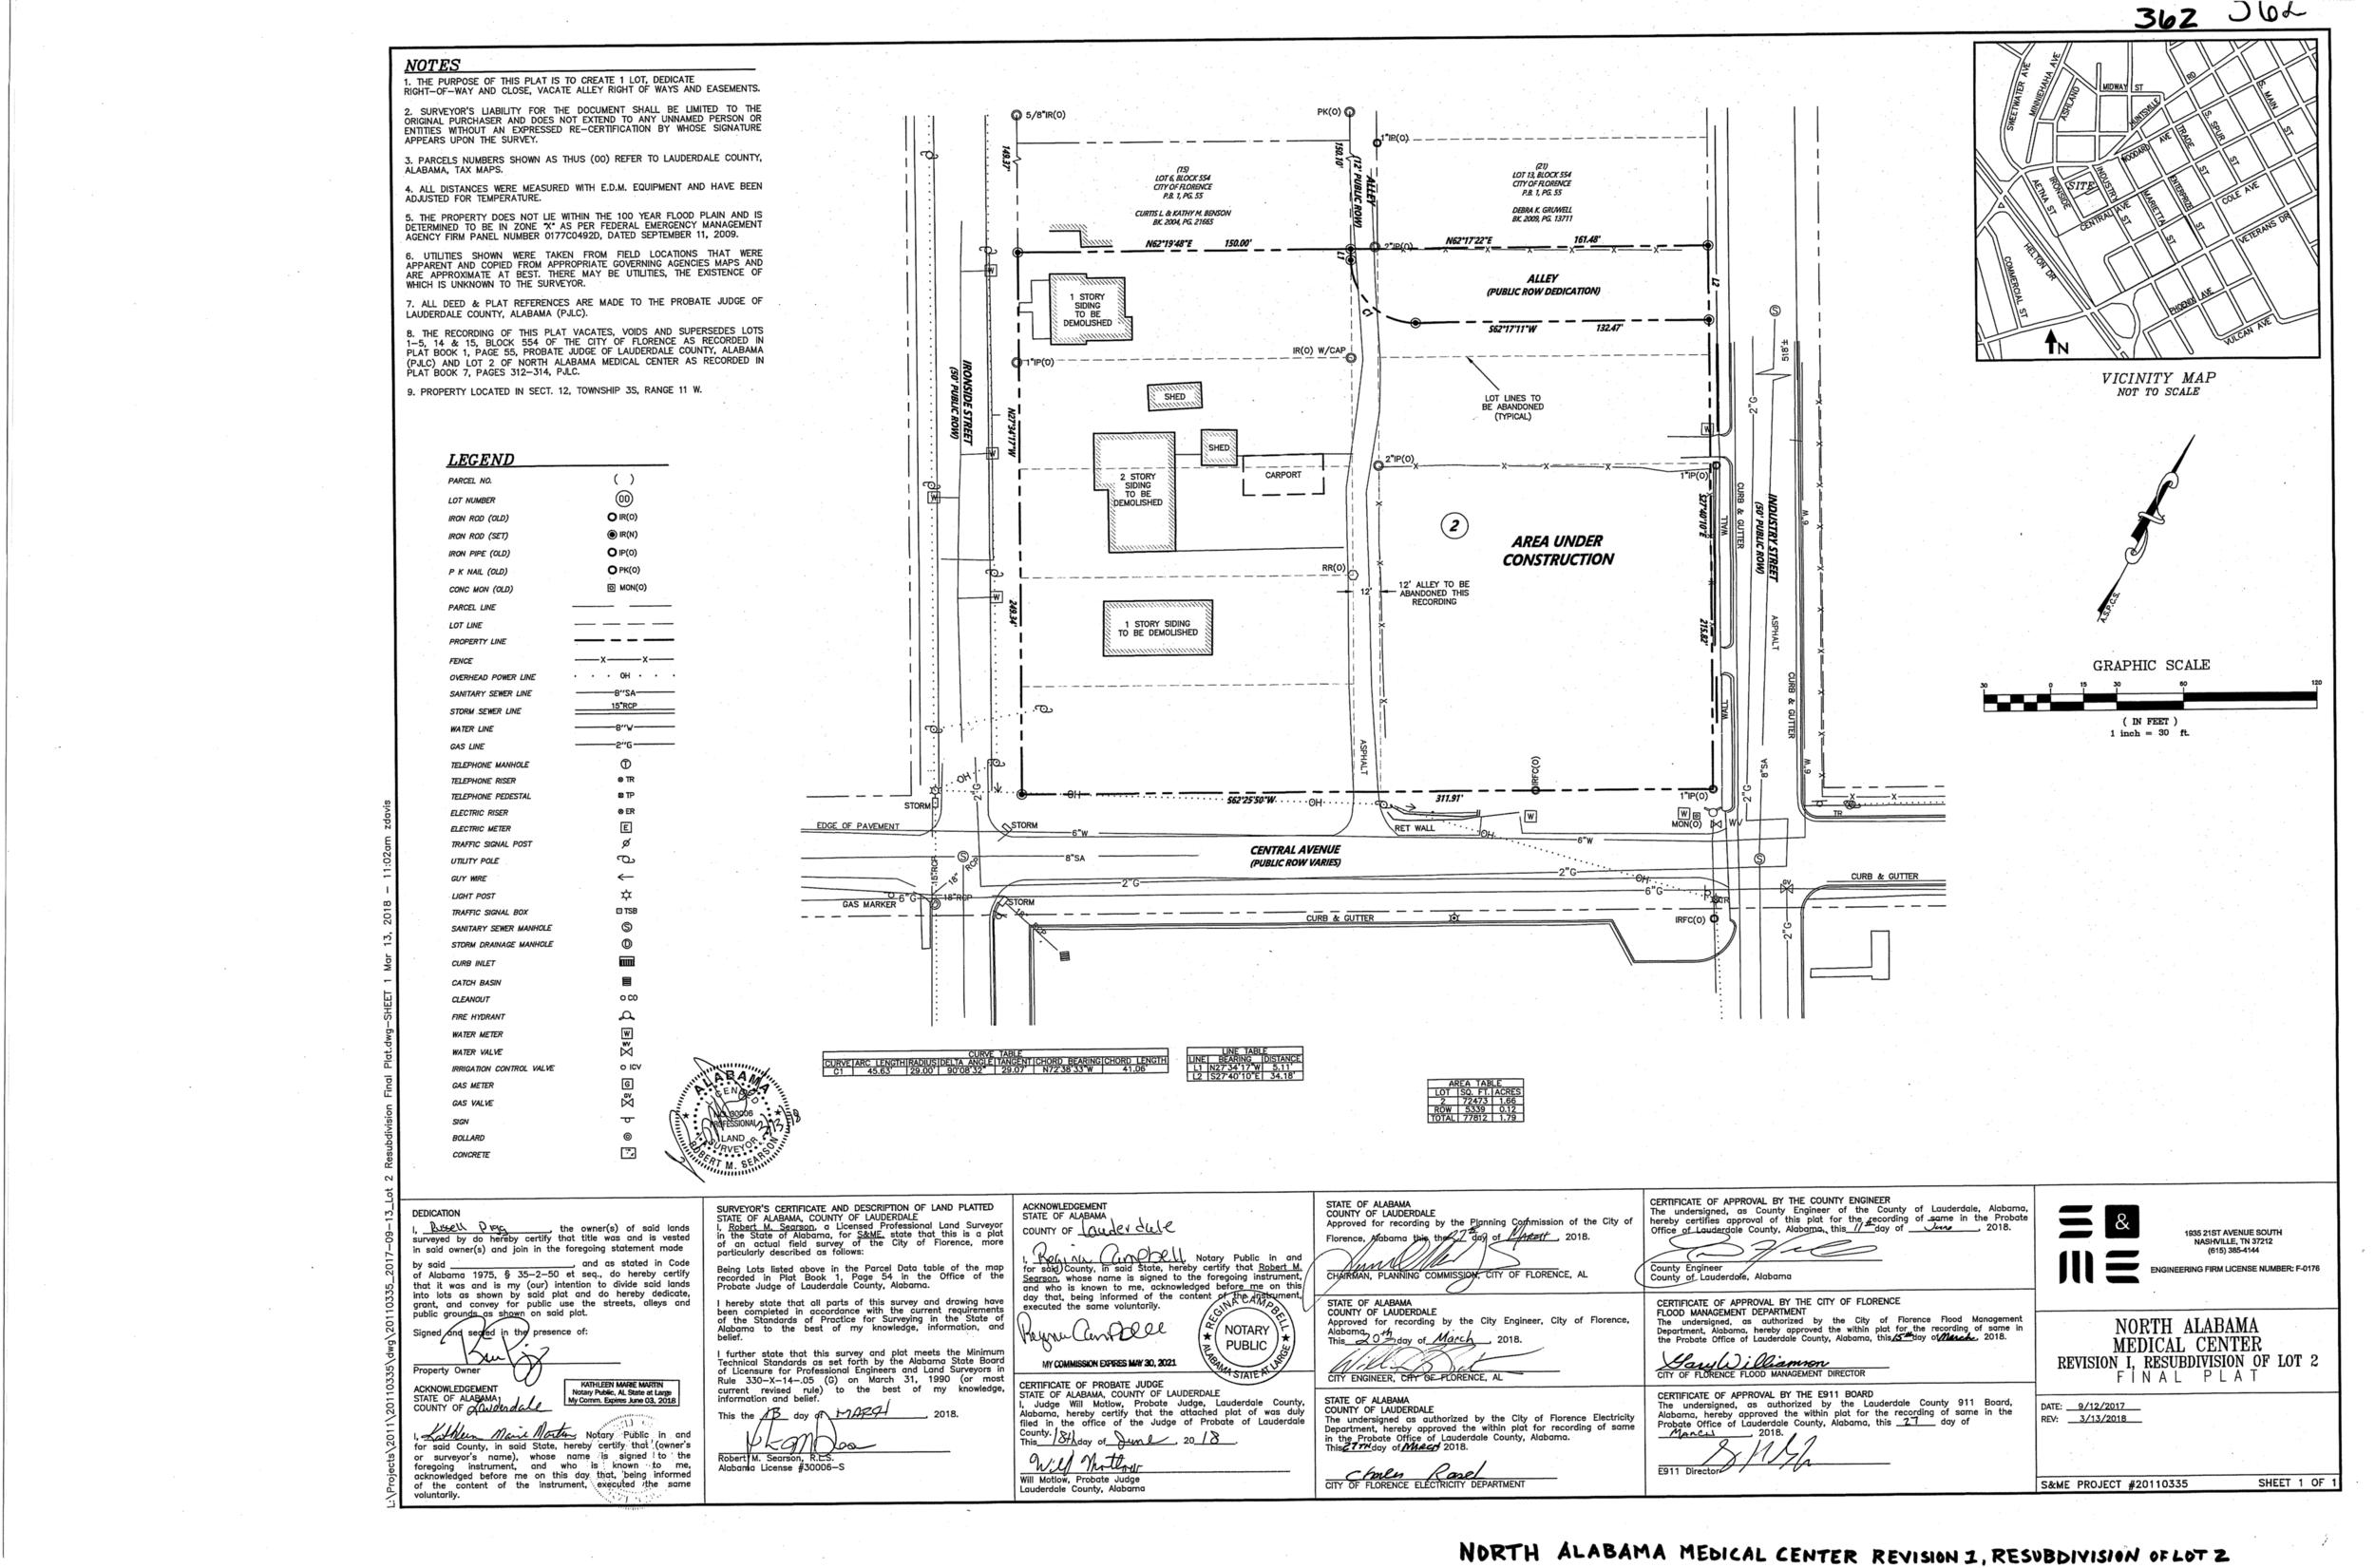 Plat-North Alabama Medical Center Revision 1, Resubdivision of Lot 2-1.png